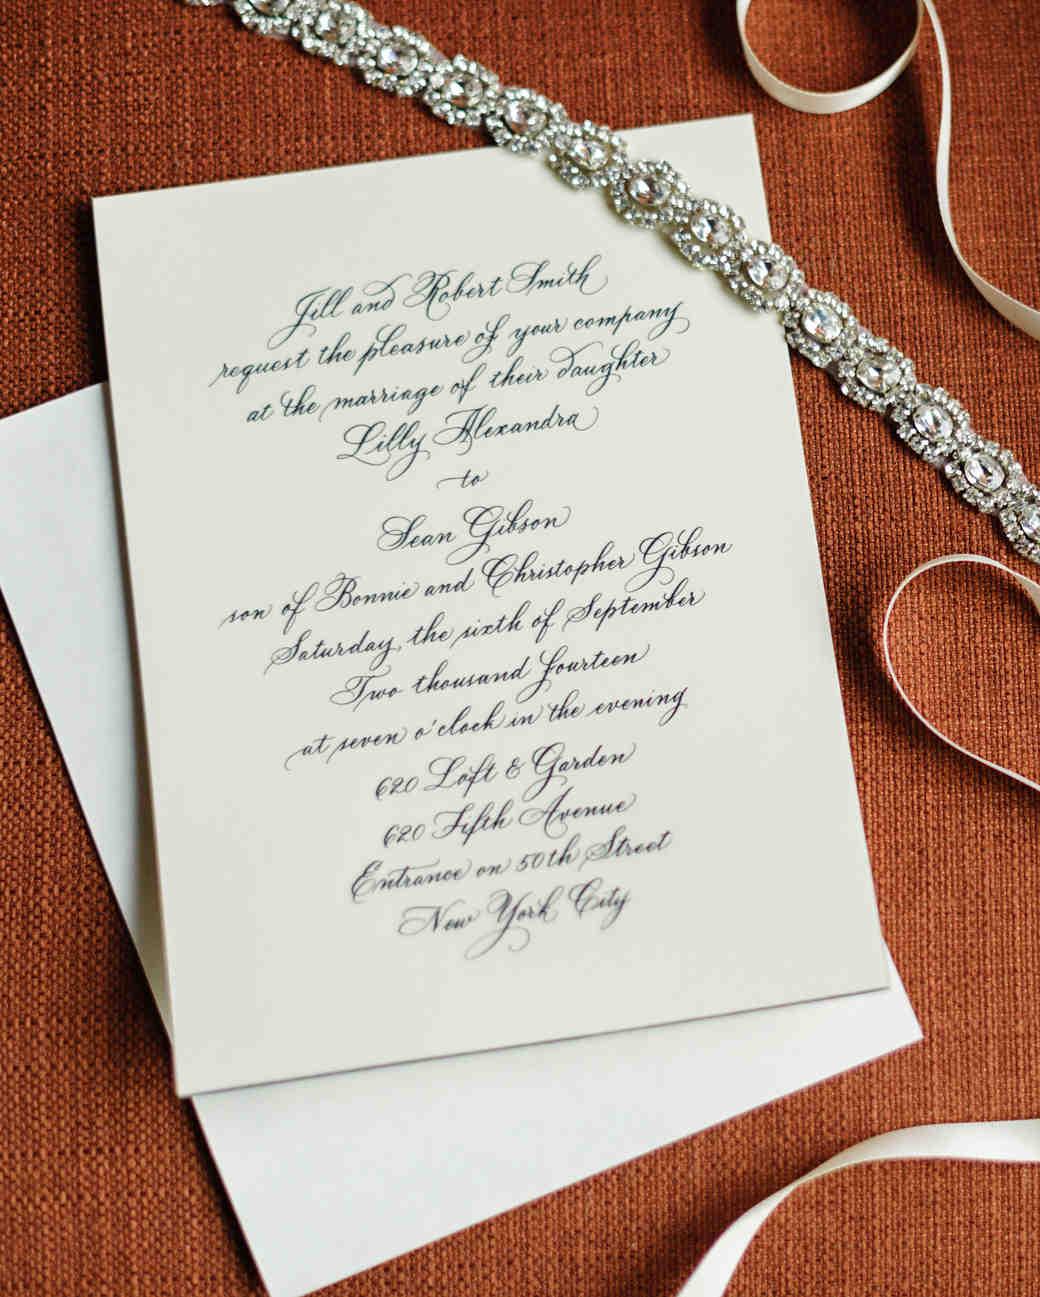 lilly-sean-wedding-invite-00017-s112089-0815.jpg